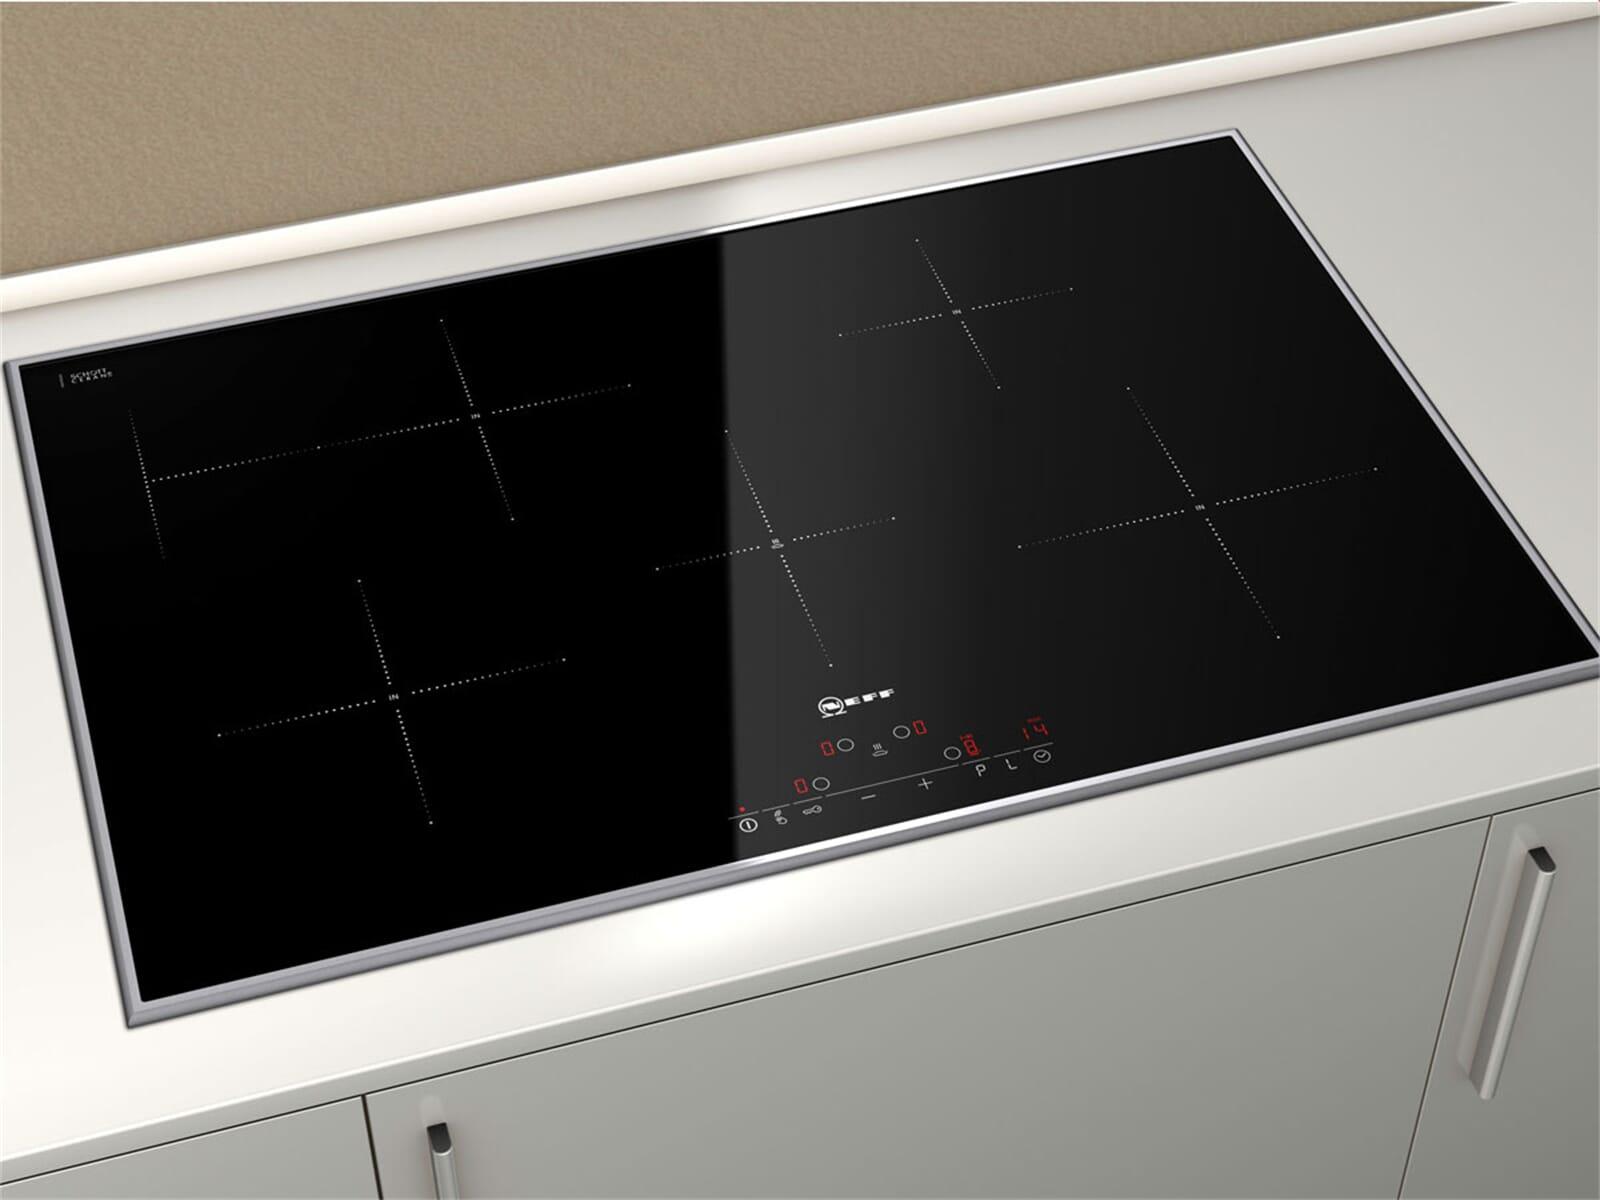 neff x80bp4 set pyrolyse backofen bp 1842 n induktion glaskeramik kochfeld td ebay. Black Bedroom Furniture Sets. Home Design Ideas